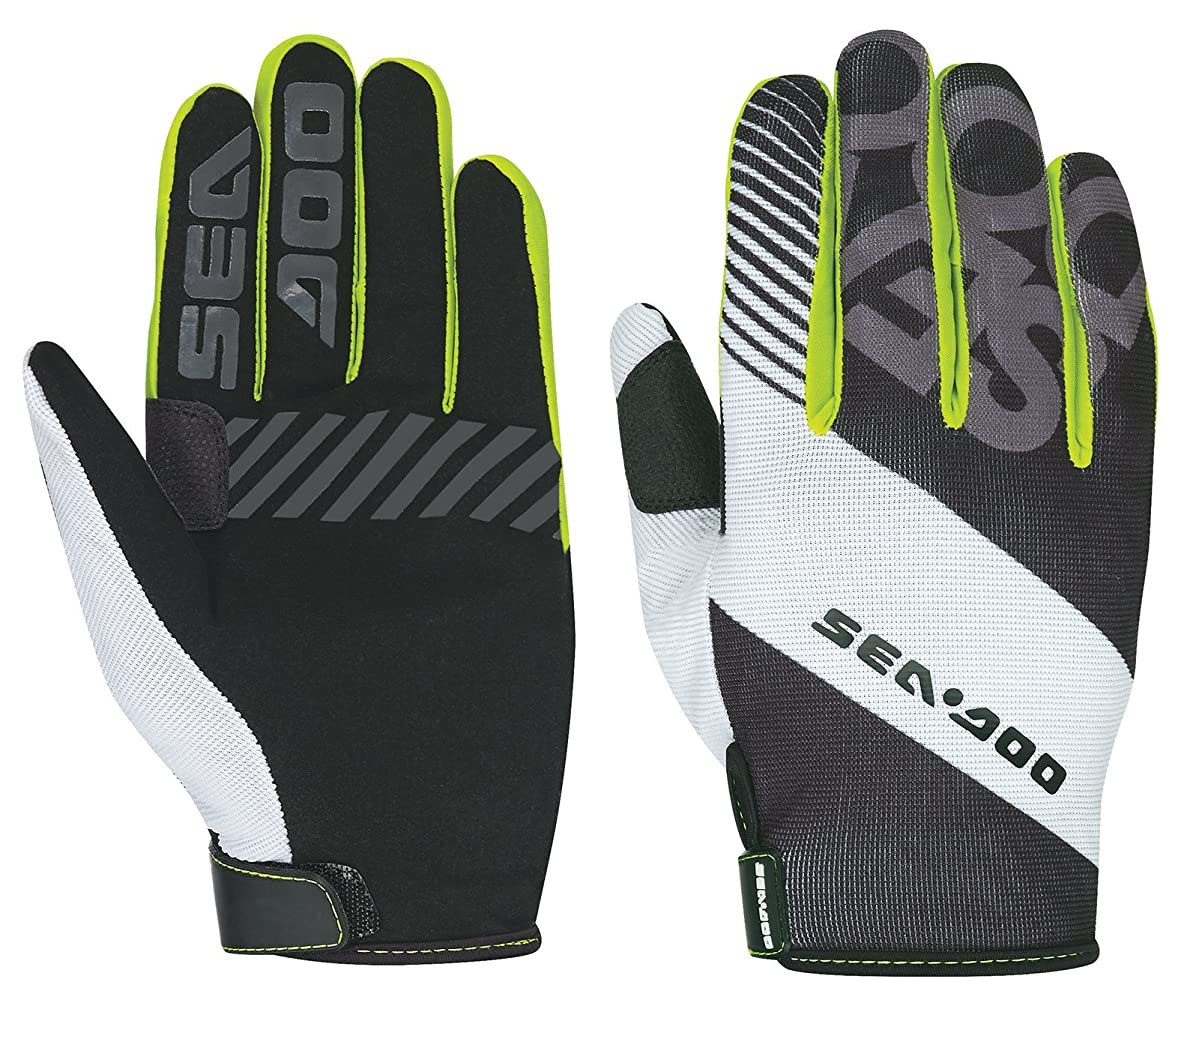 Sea Doo Attitude Full-Finger Gloves (Small)